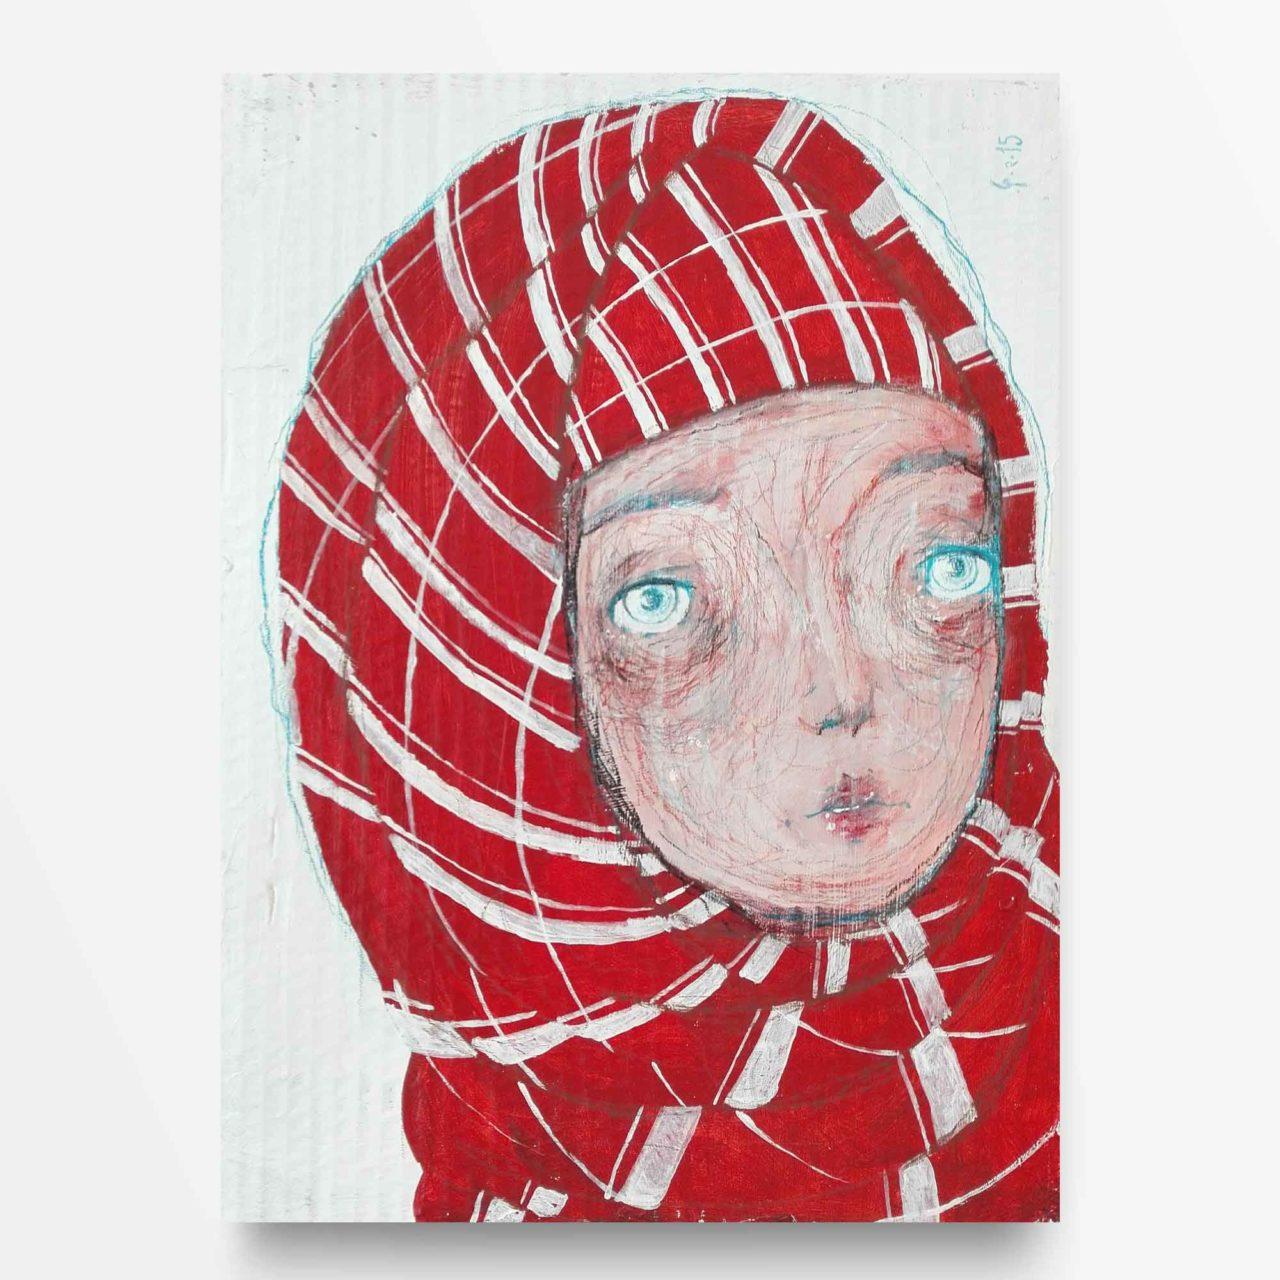 2015 Burnout Ragazza con Hijab di Diego Gabriele